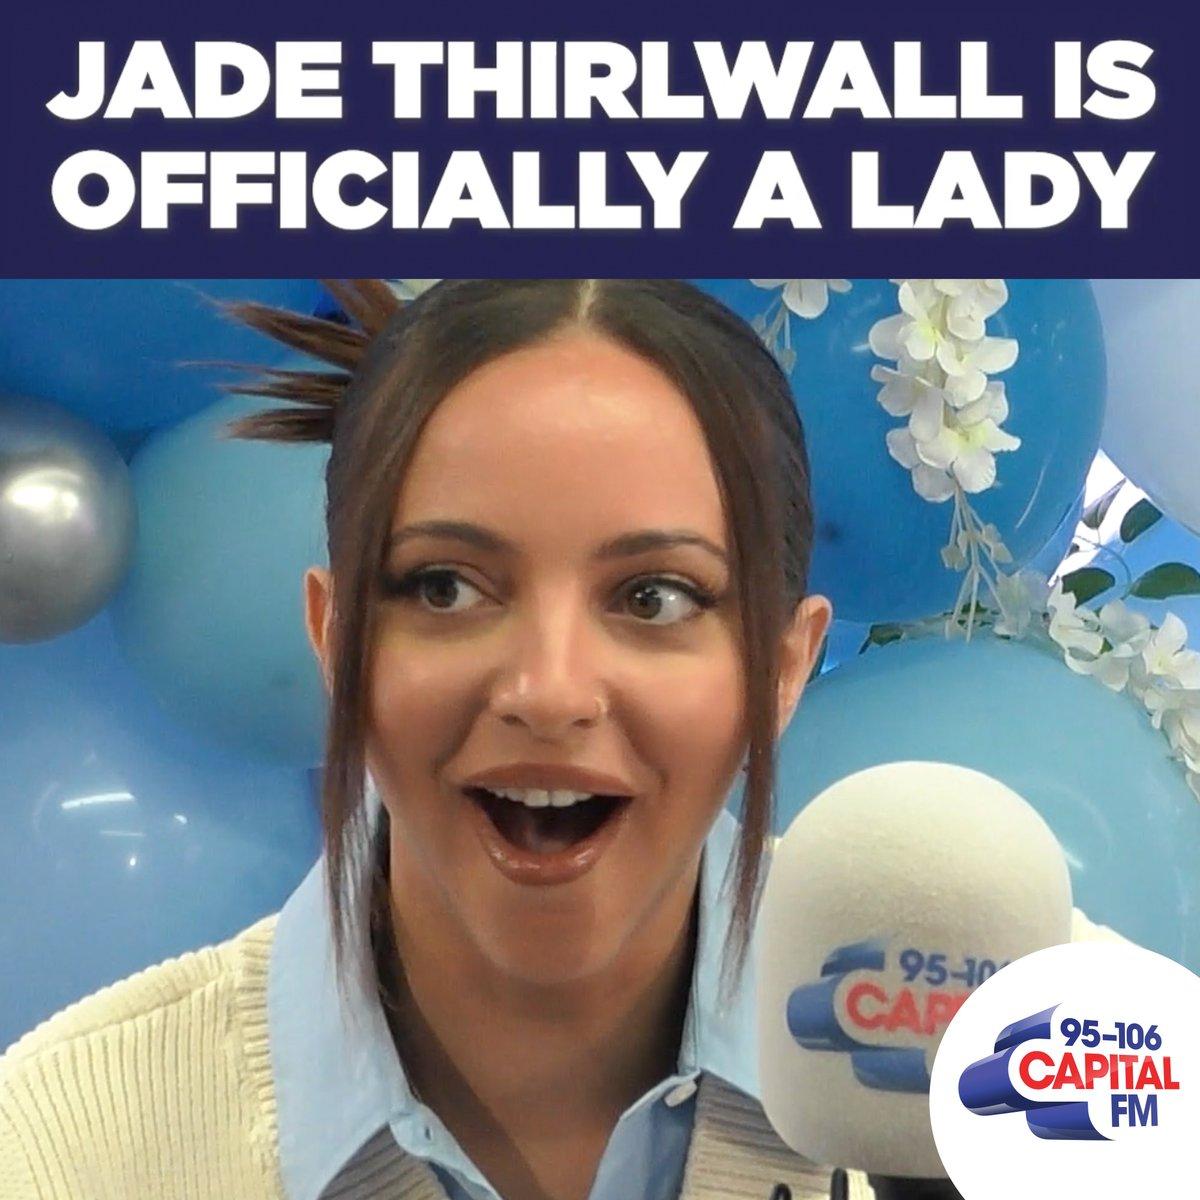 She was already royalty, we just made it LEGIT 👸 @littlemix  #LadyJade  https://t.co/Z06hngdTkt